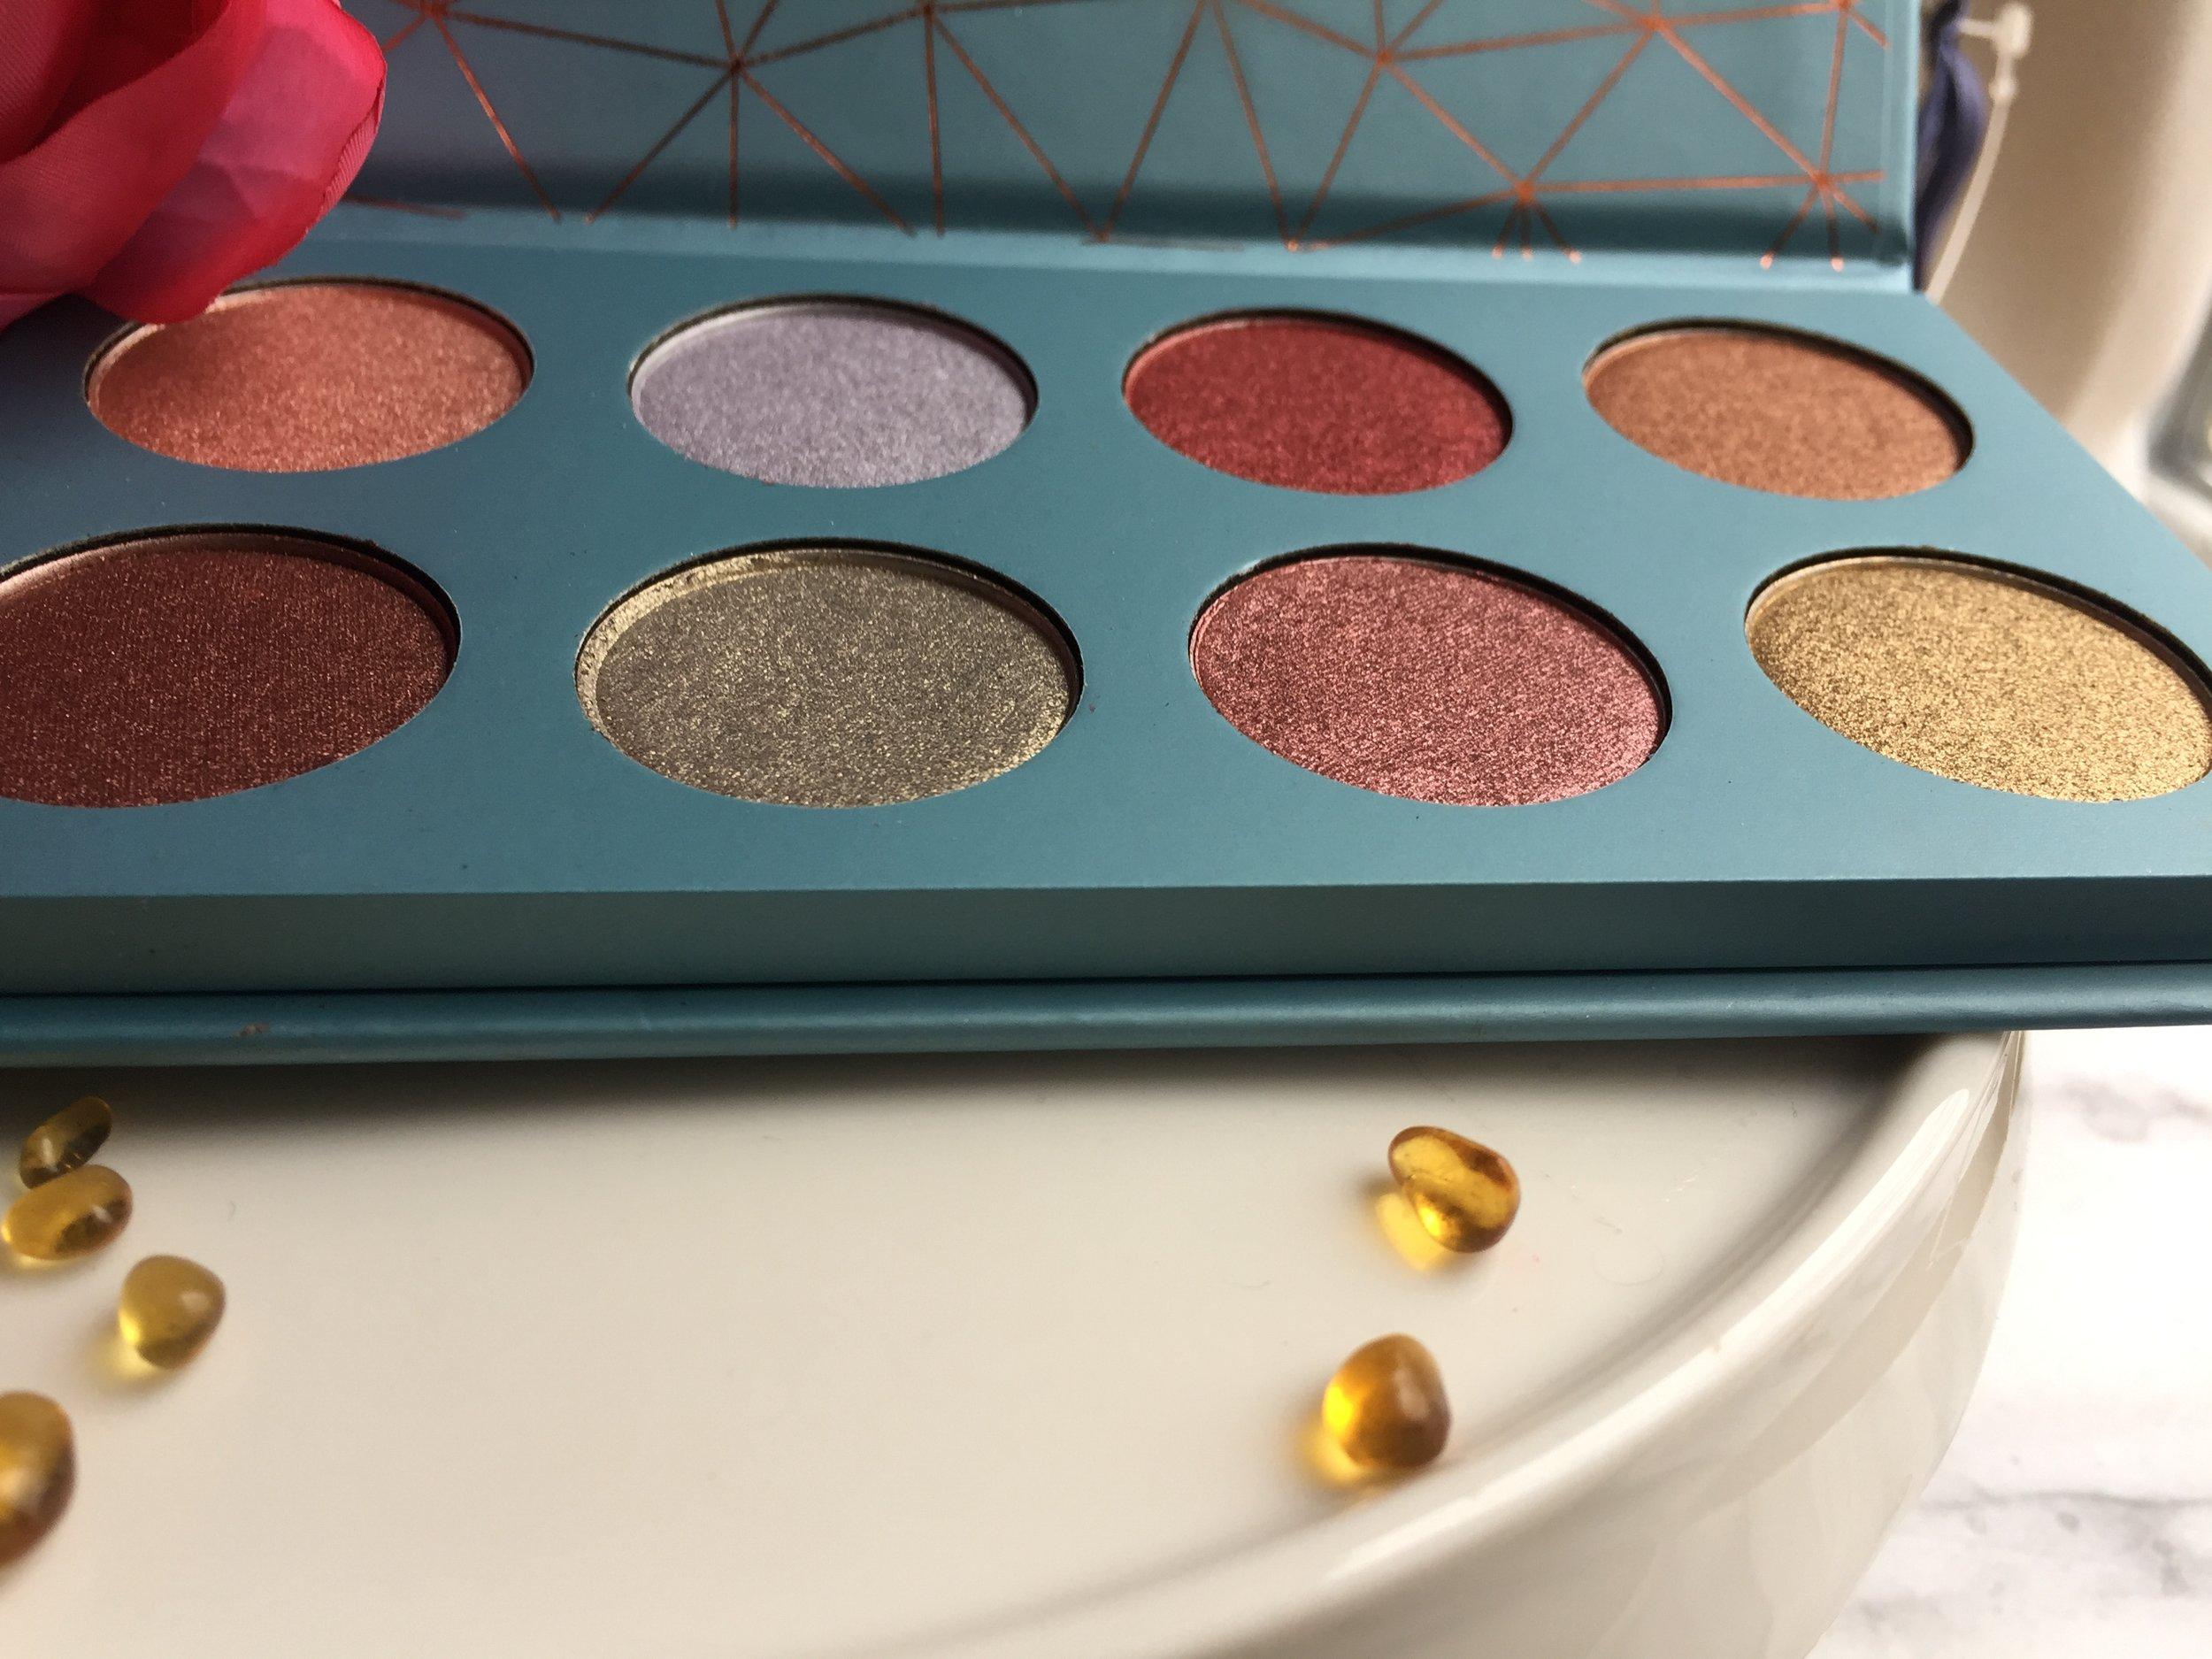 ColourPop Semi-Precious Eyeshadow Palette